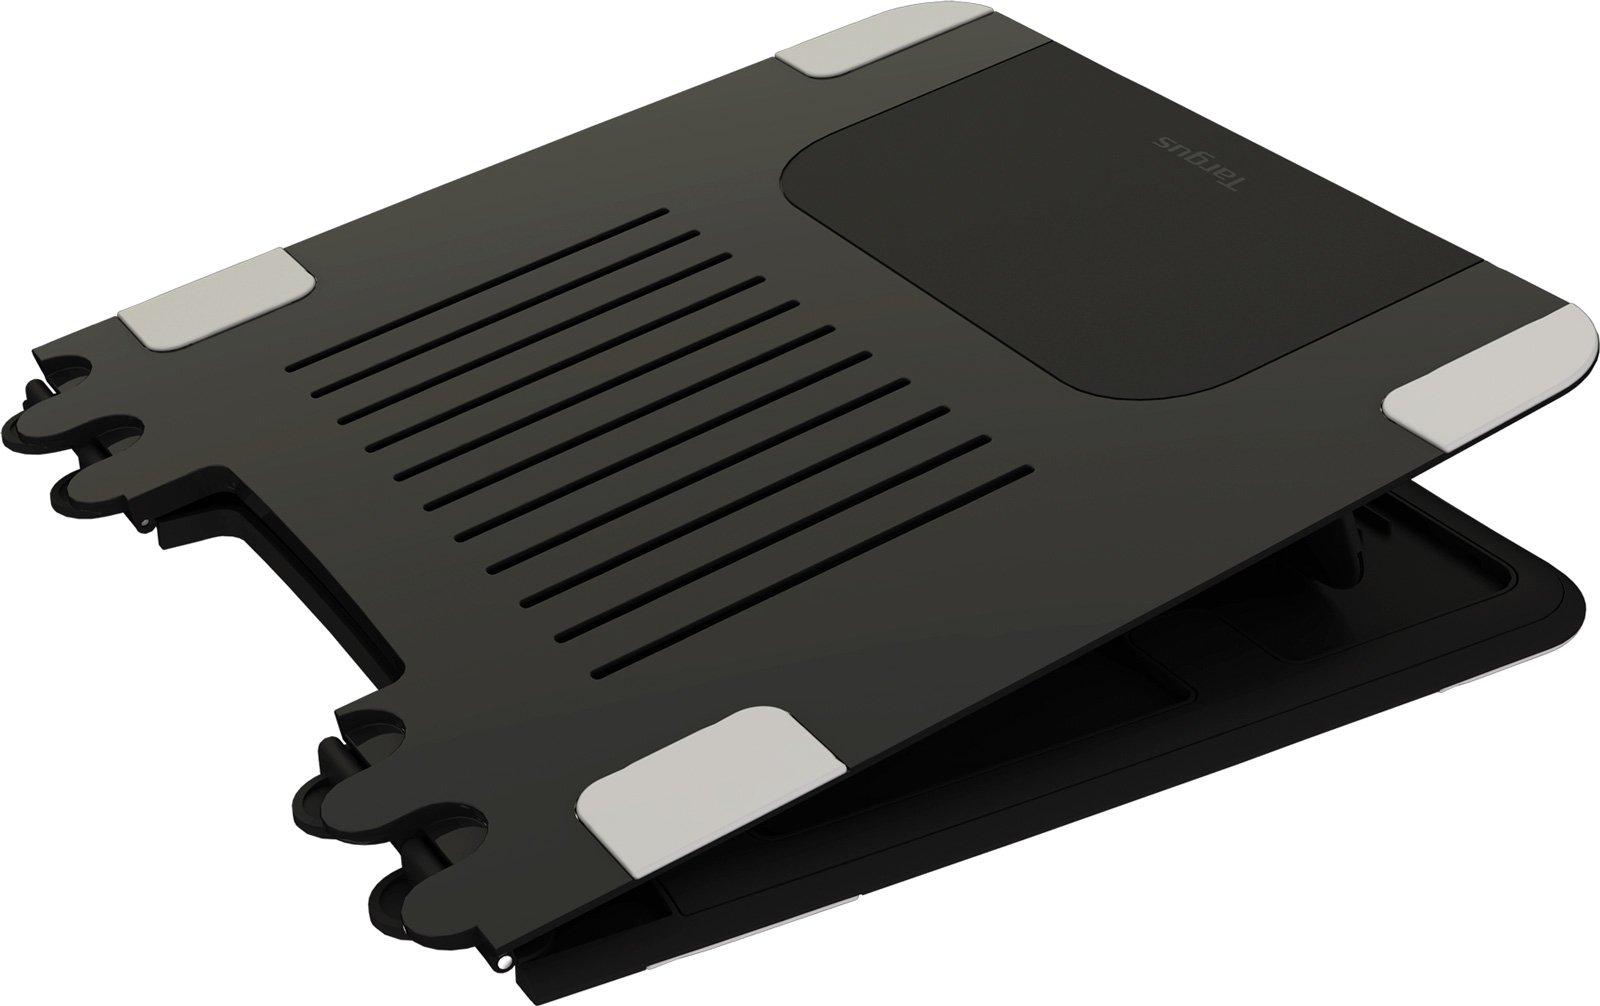 Targus Compact Laptop Desk AWE56US-Black with Gray